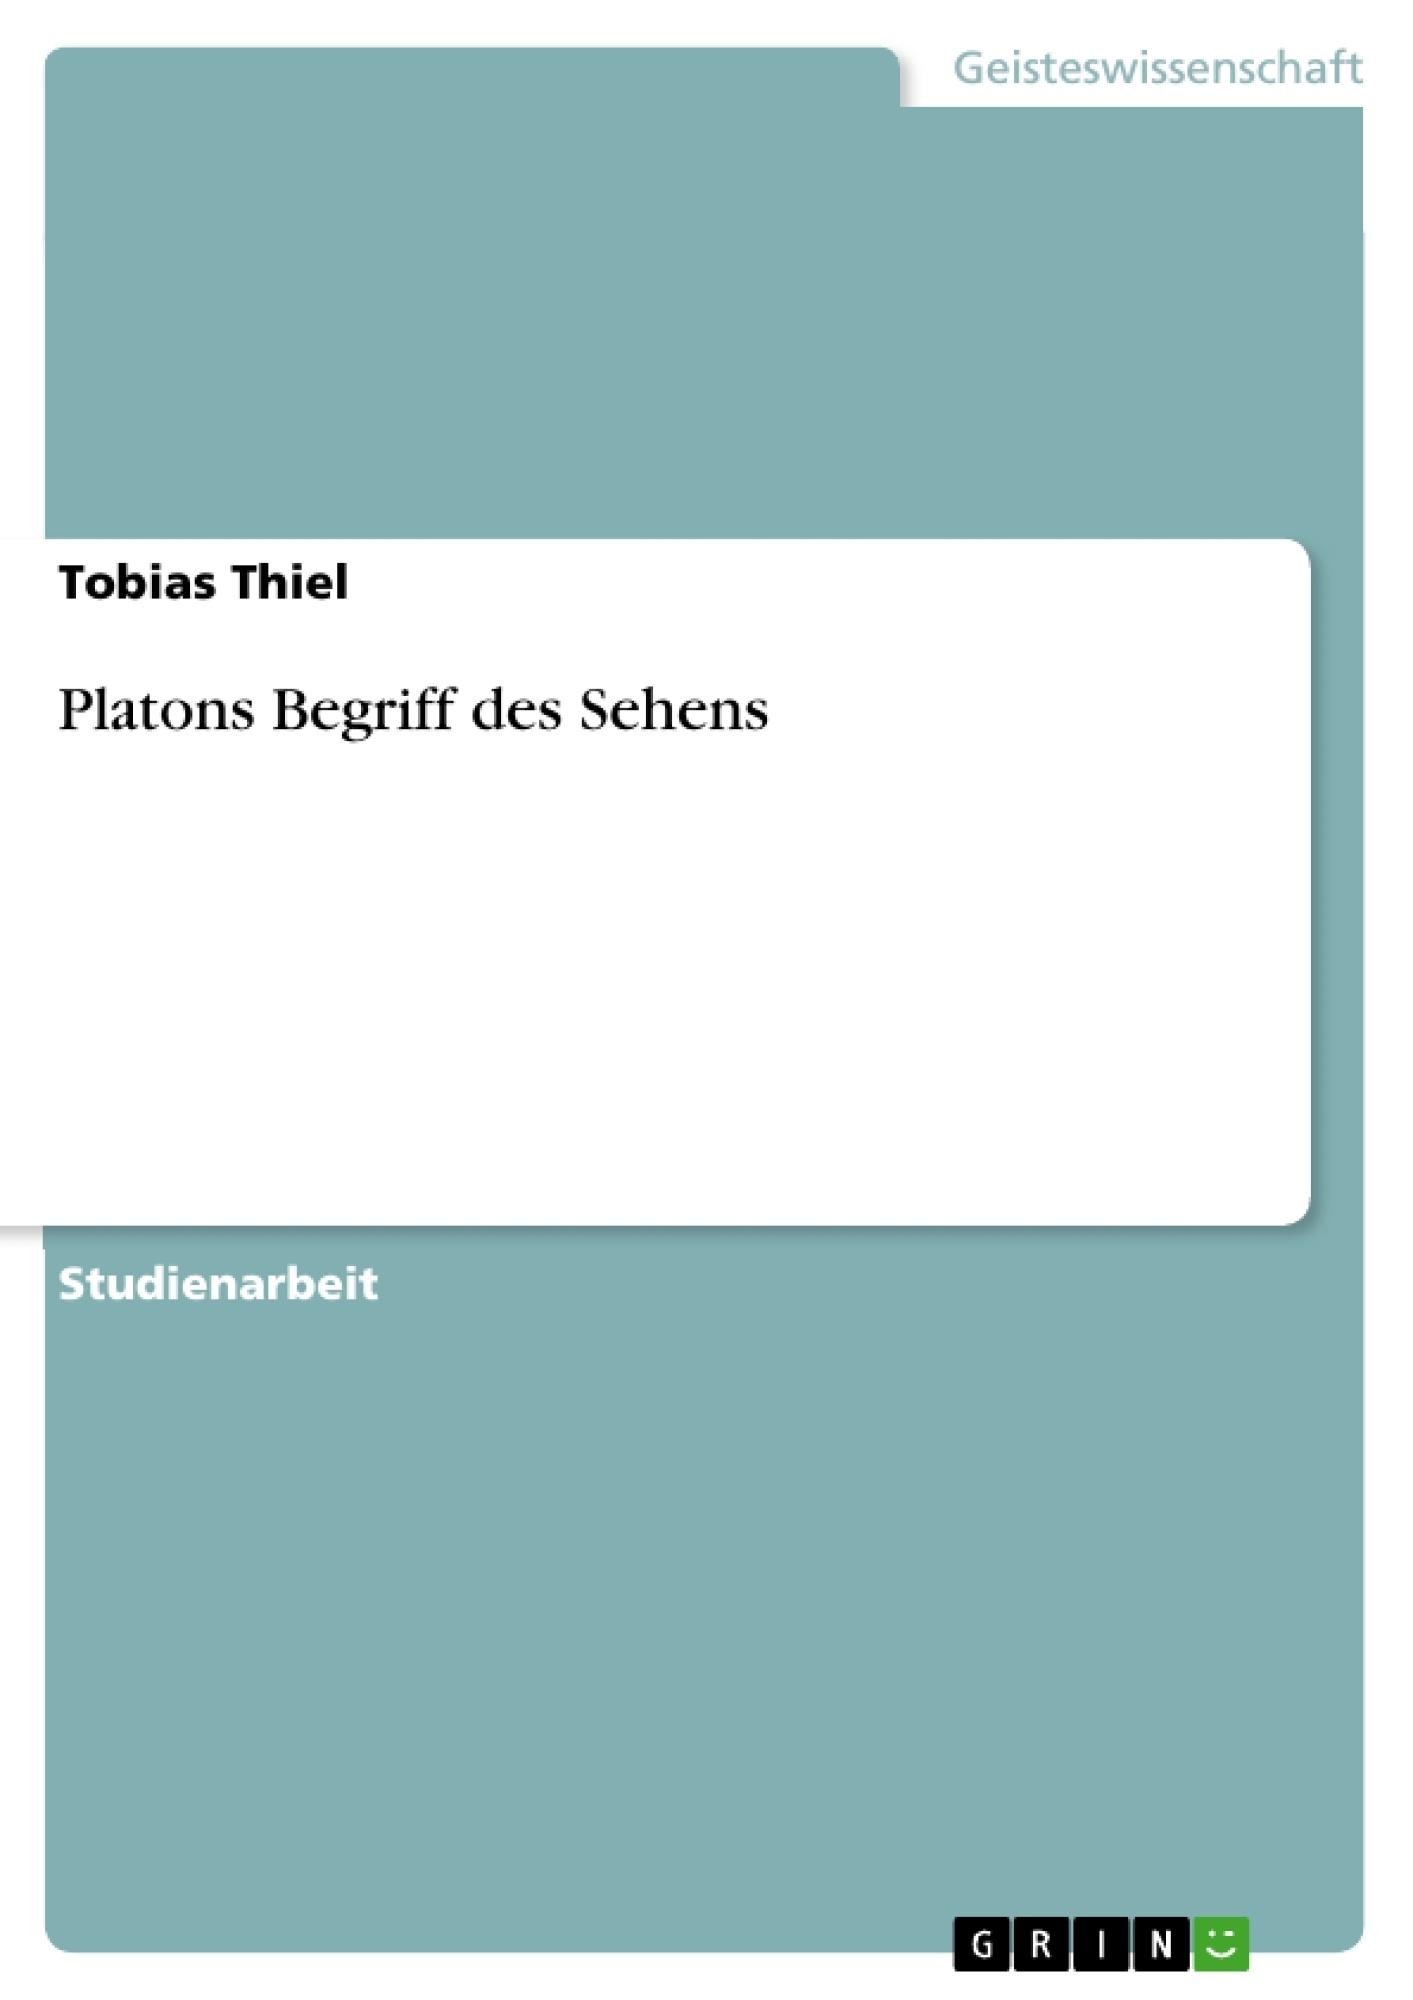 Titel: Platons Begriff des Sehens